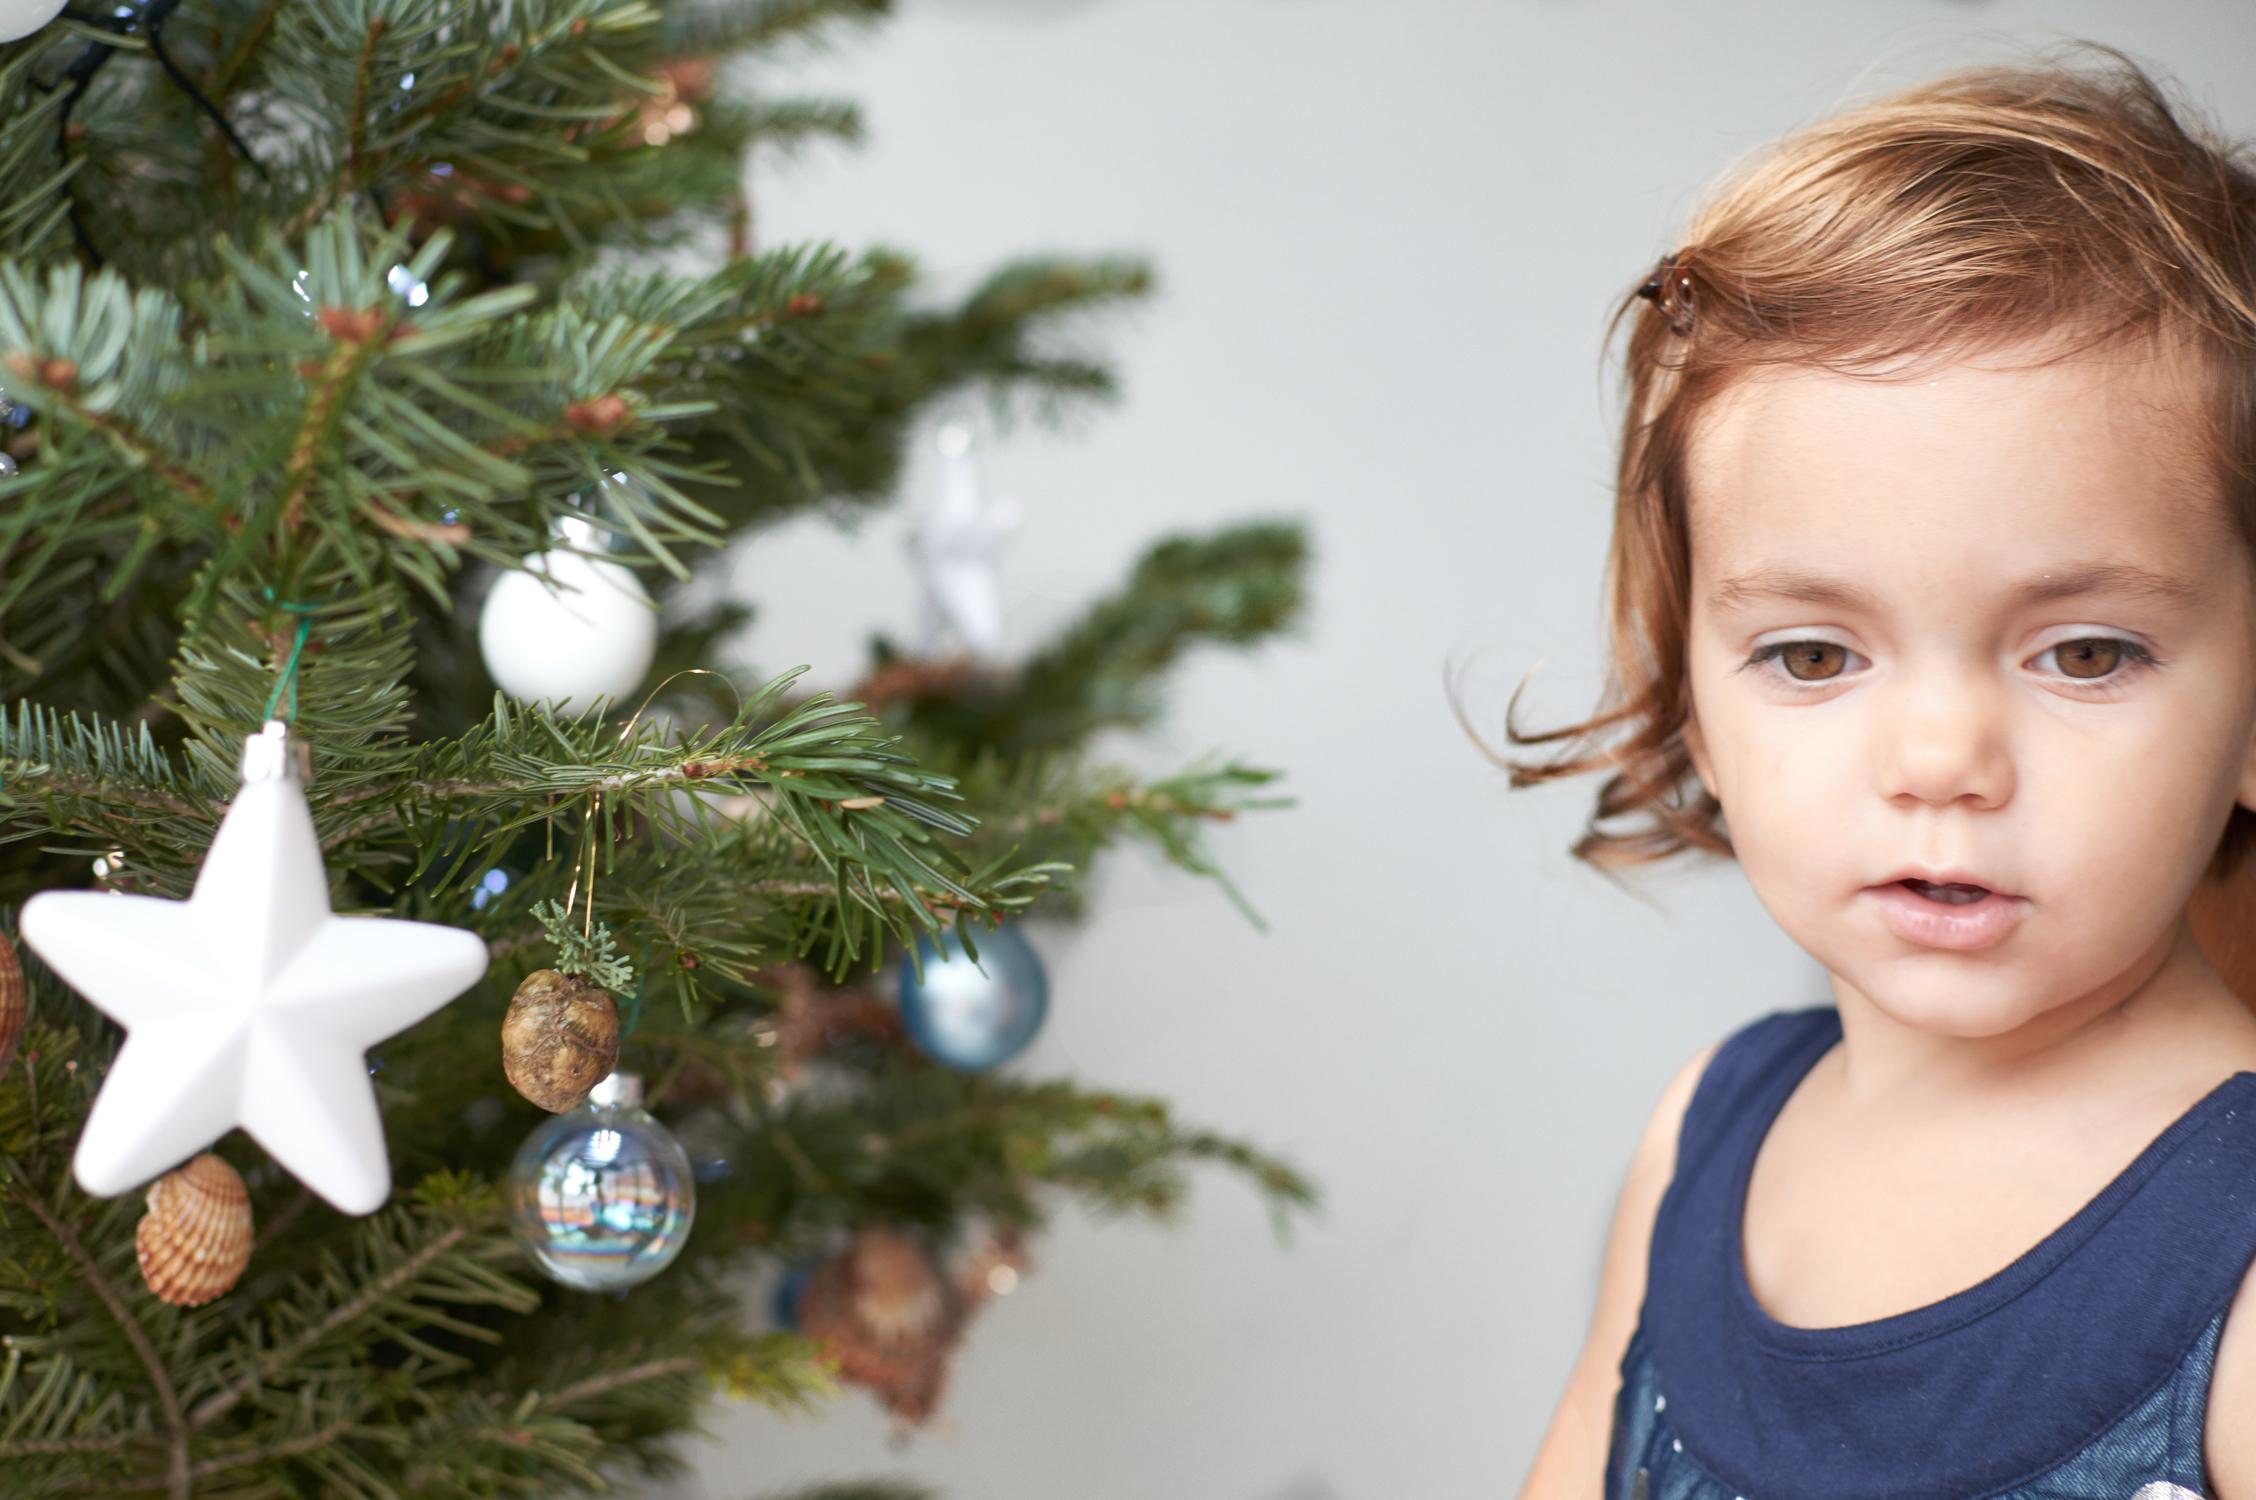 Child_photography_ideas-8